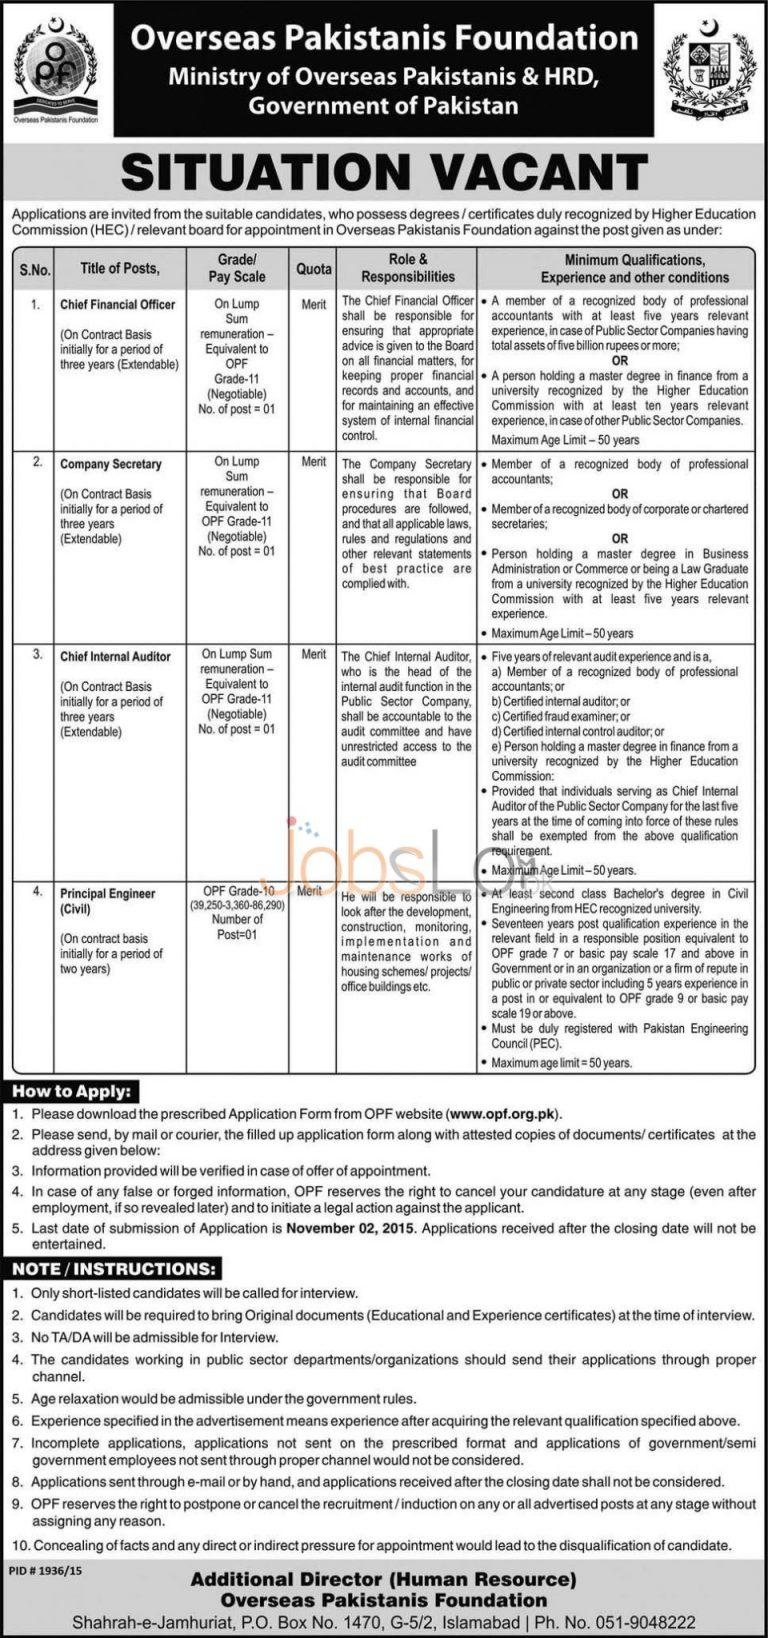 Overseas Pakistani Foundation OPF Jobs Application Form 2015